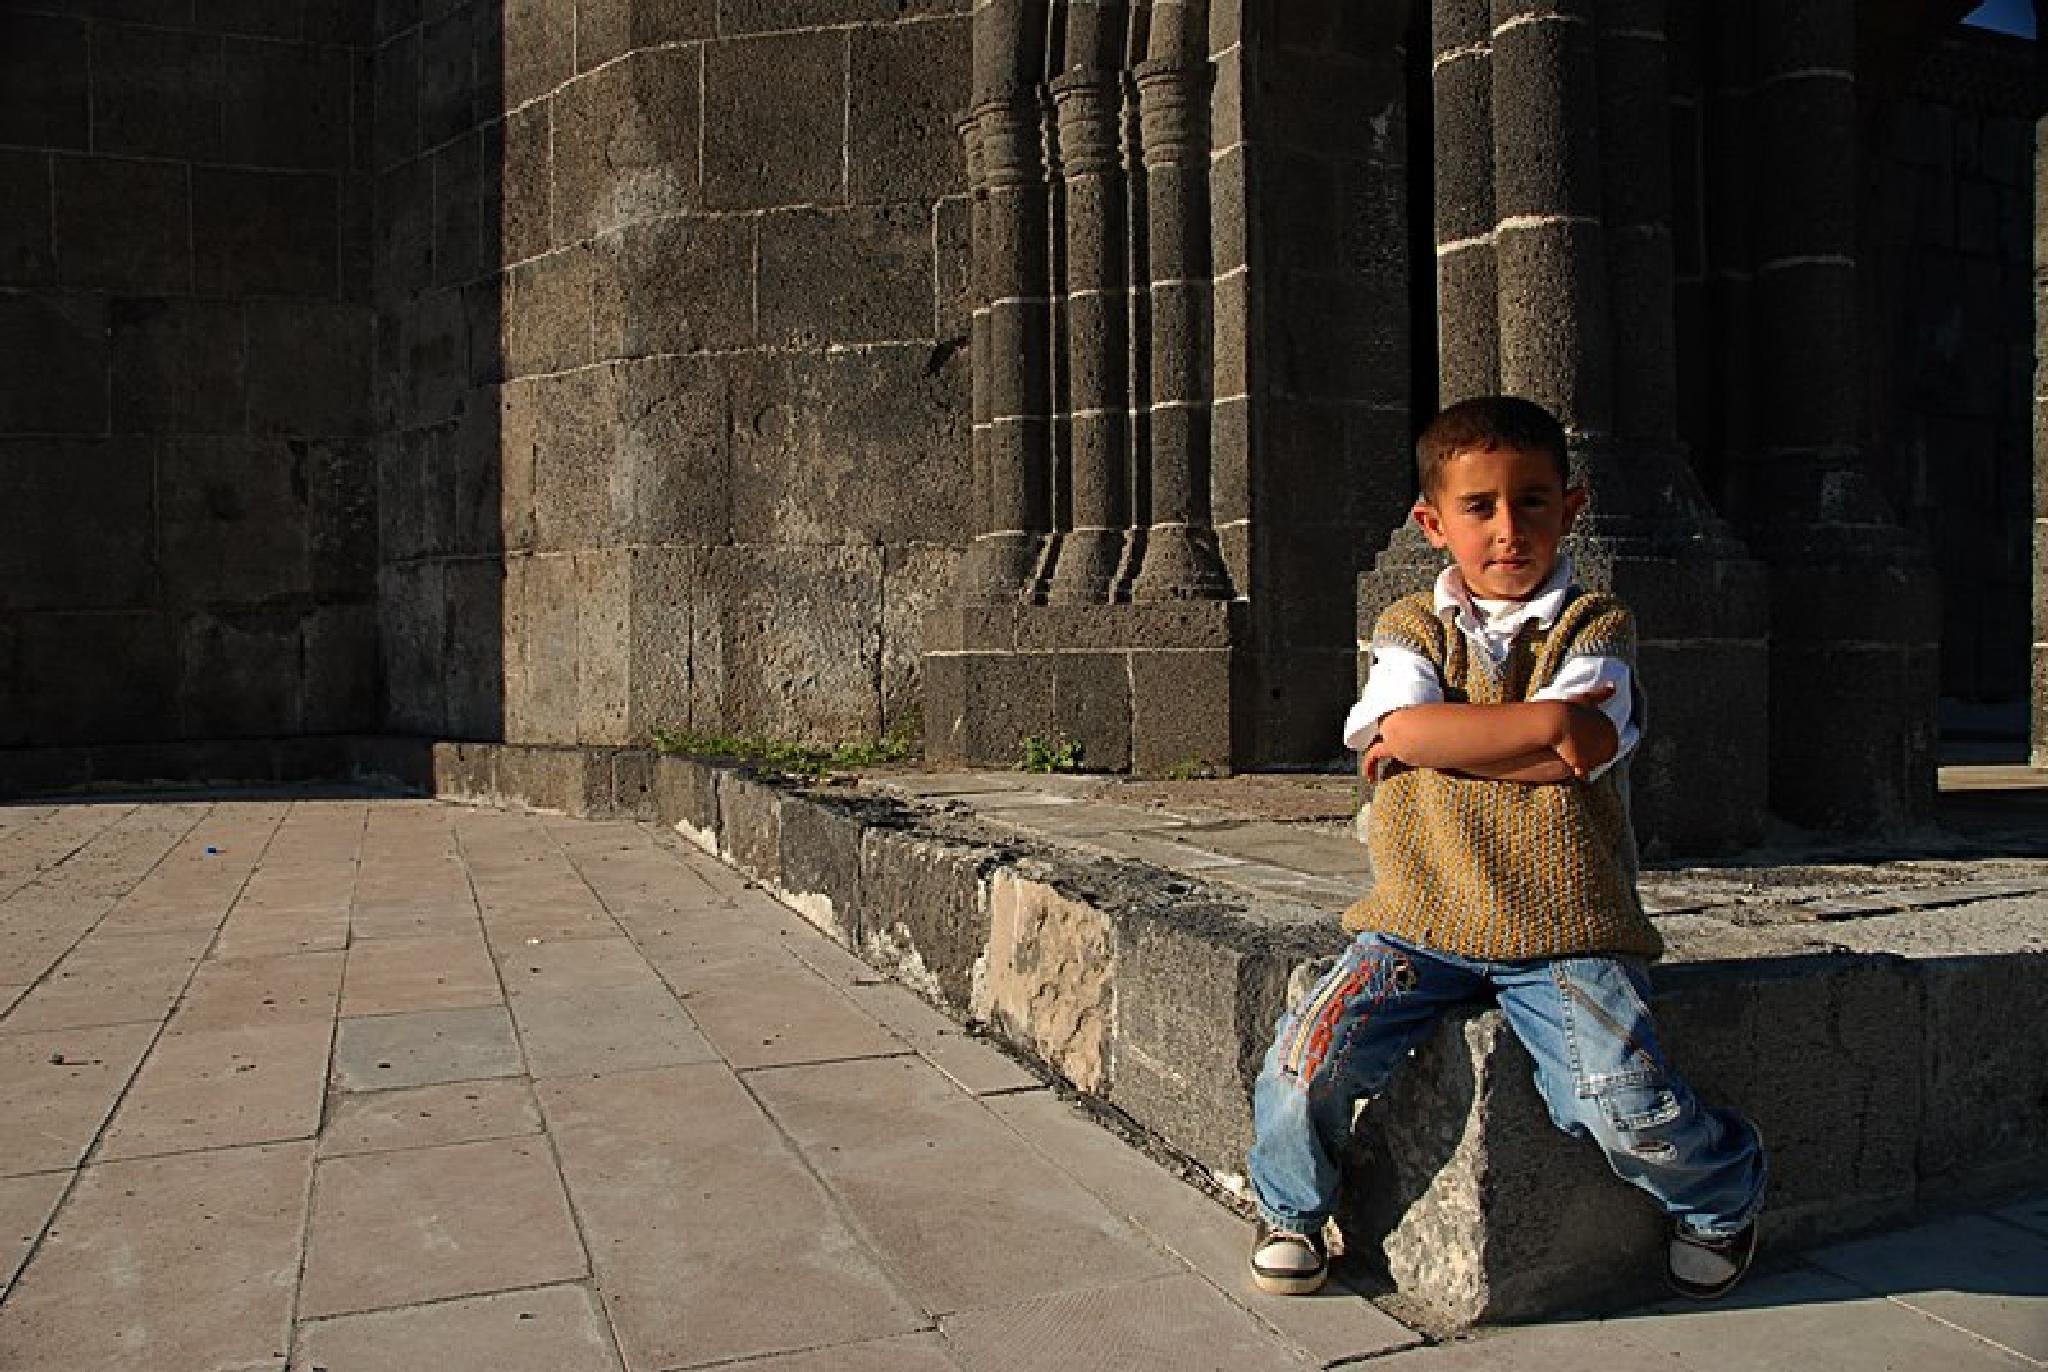 Real Boys 13 by murat sahin